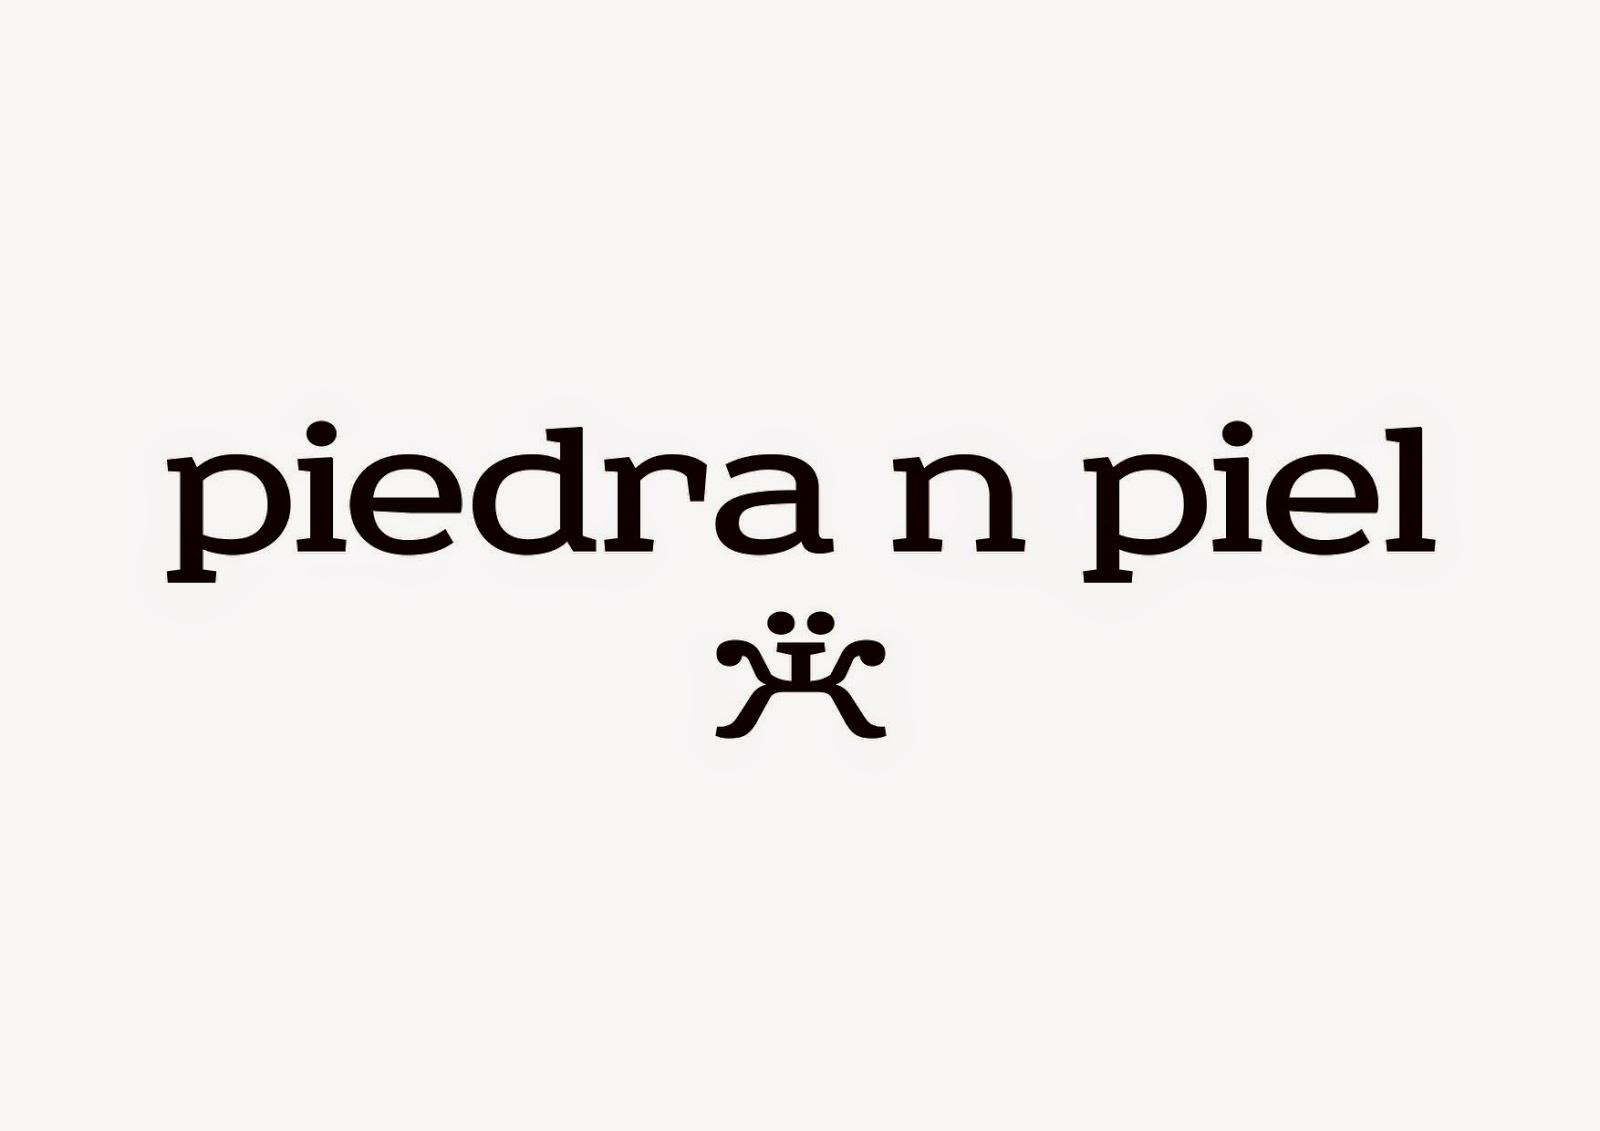 PIEDRA N PIEL